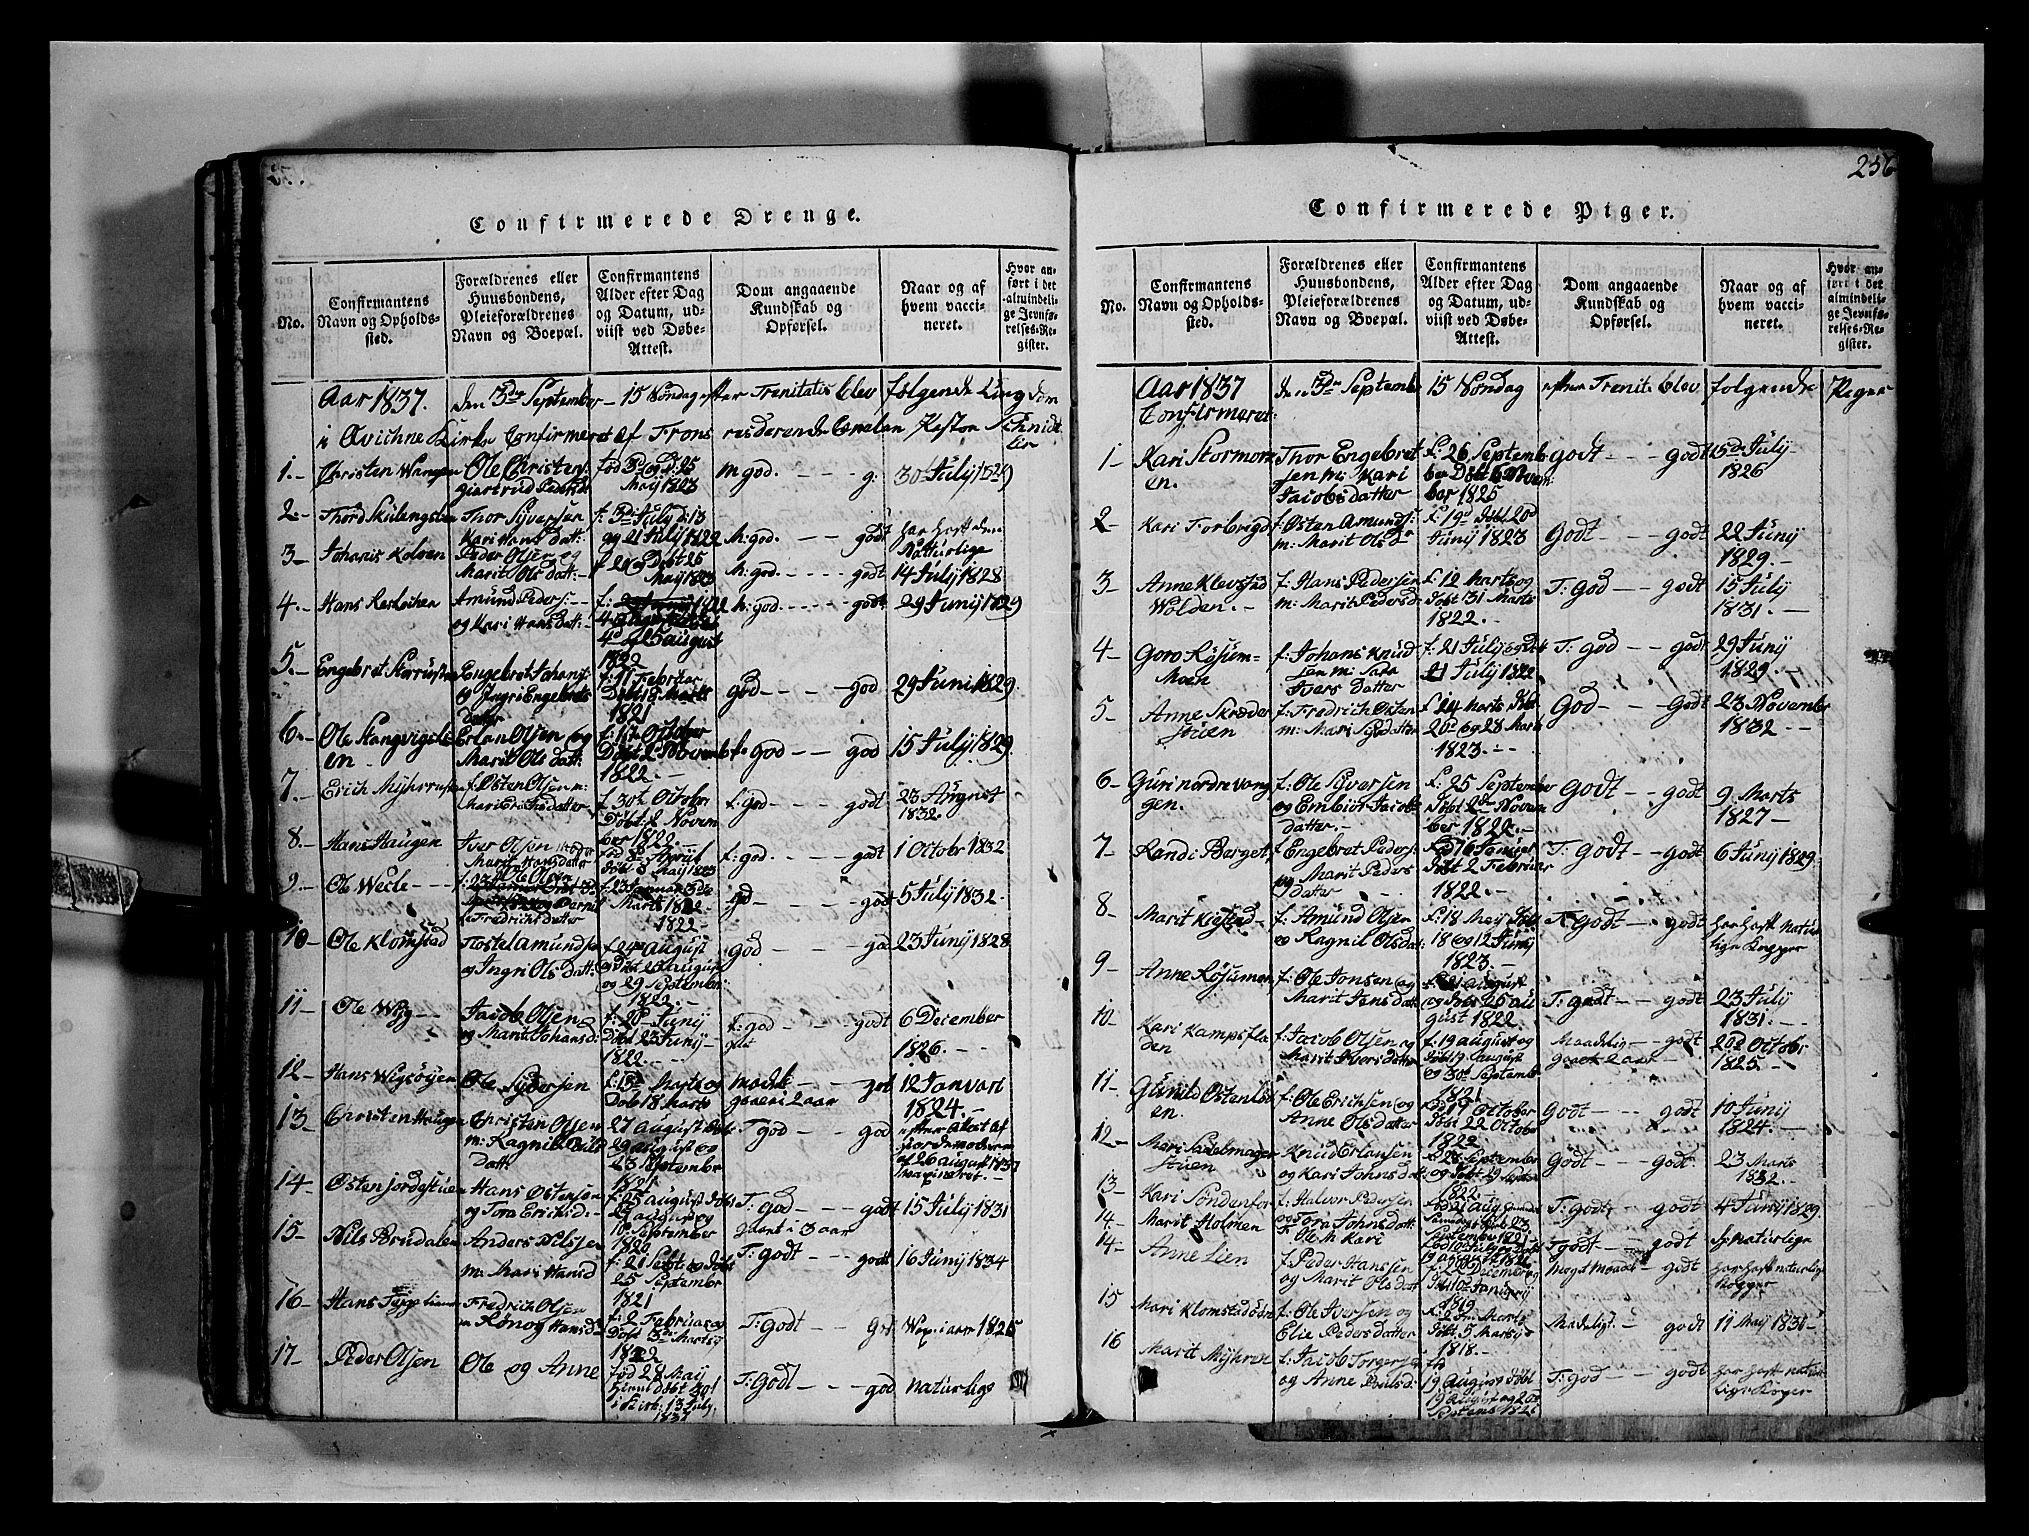 SAH, Fron prestekontor, H/Ha/Hab/L0002: Klokkerbok nr. 2, 1816-1850, s. 256